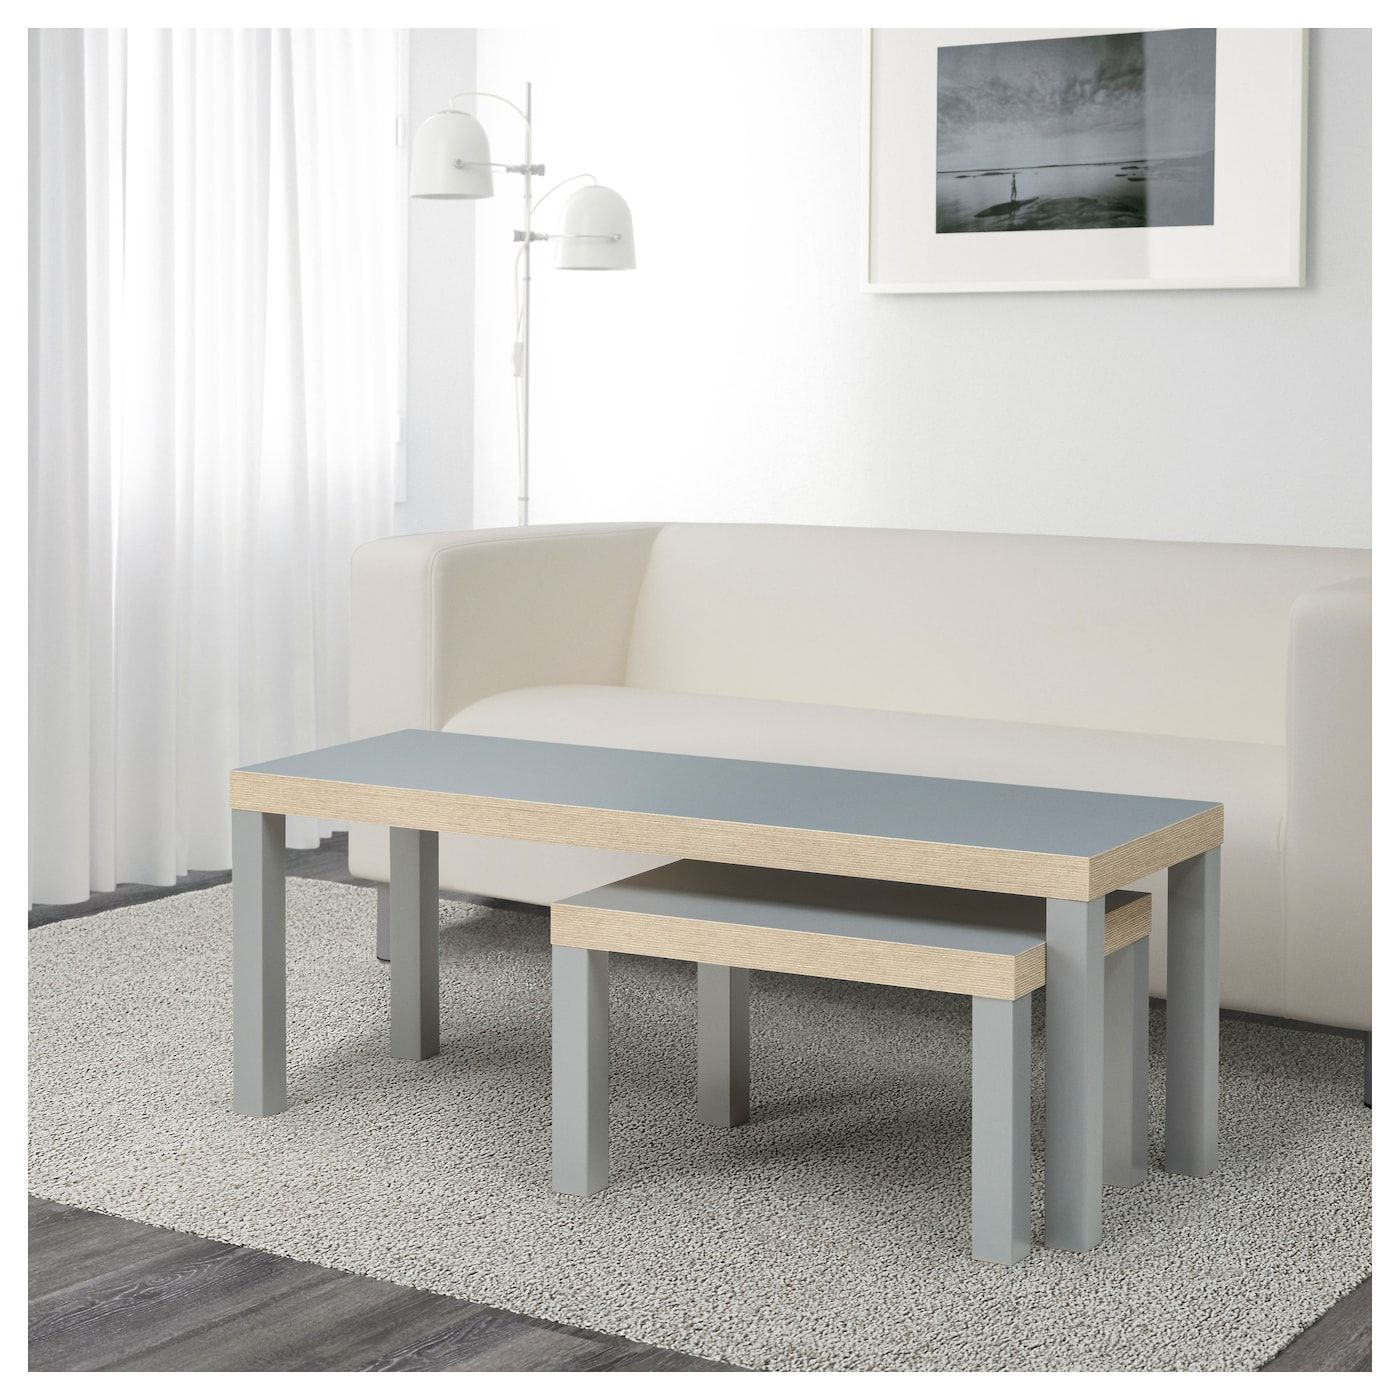 10+ White coffee table set ikea ideas in 2021